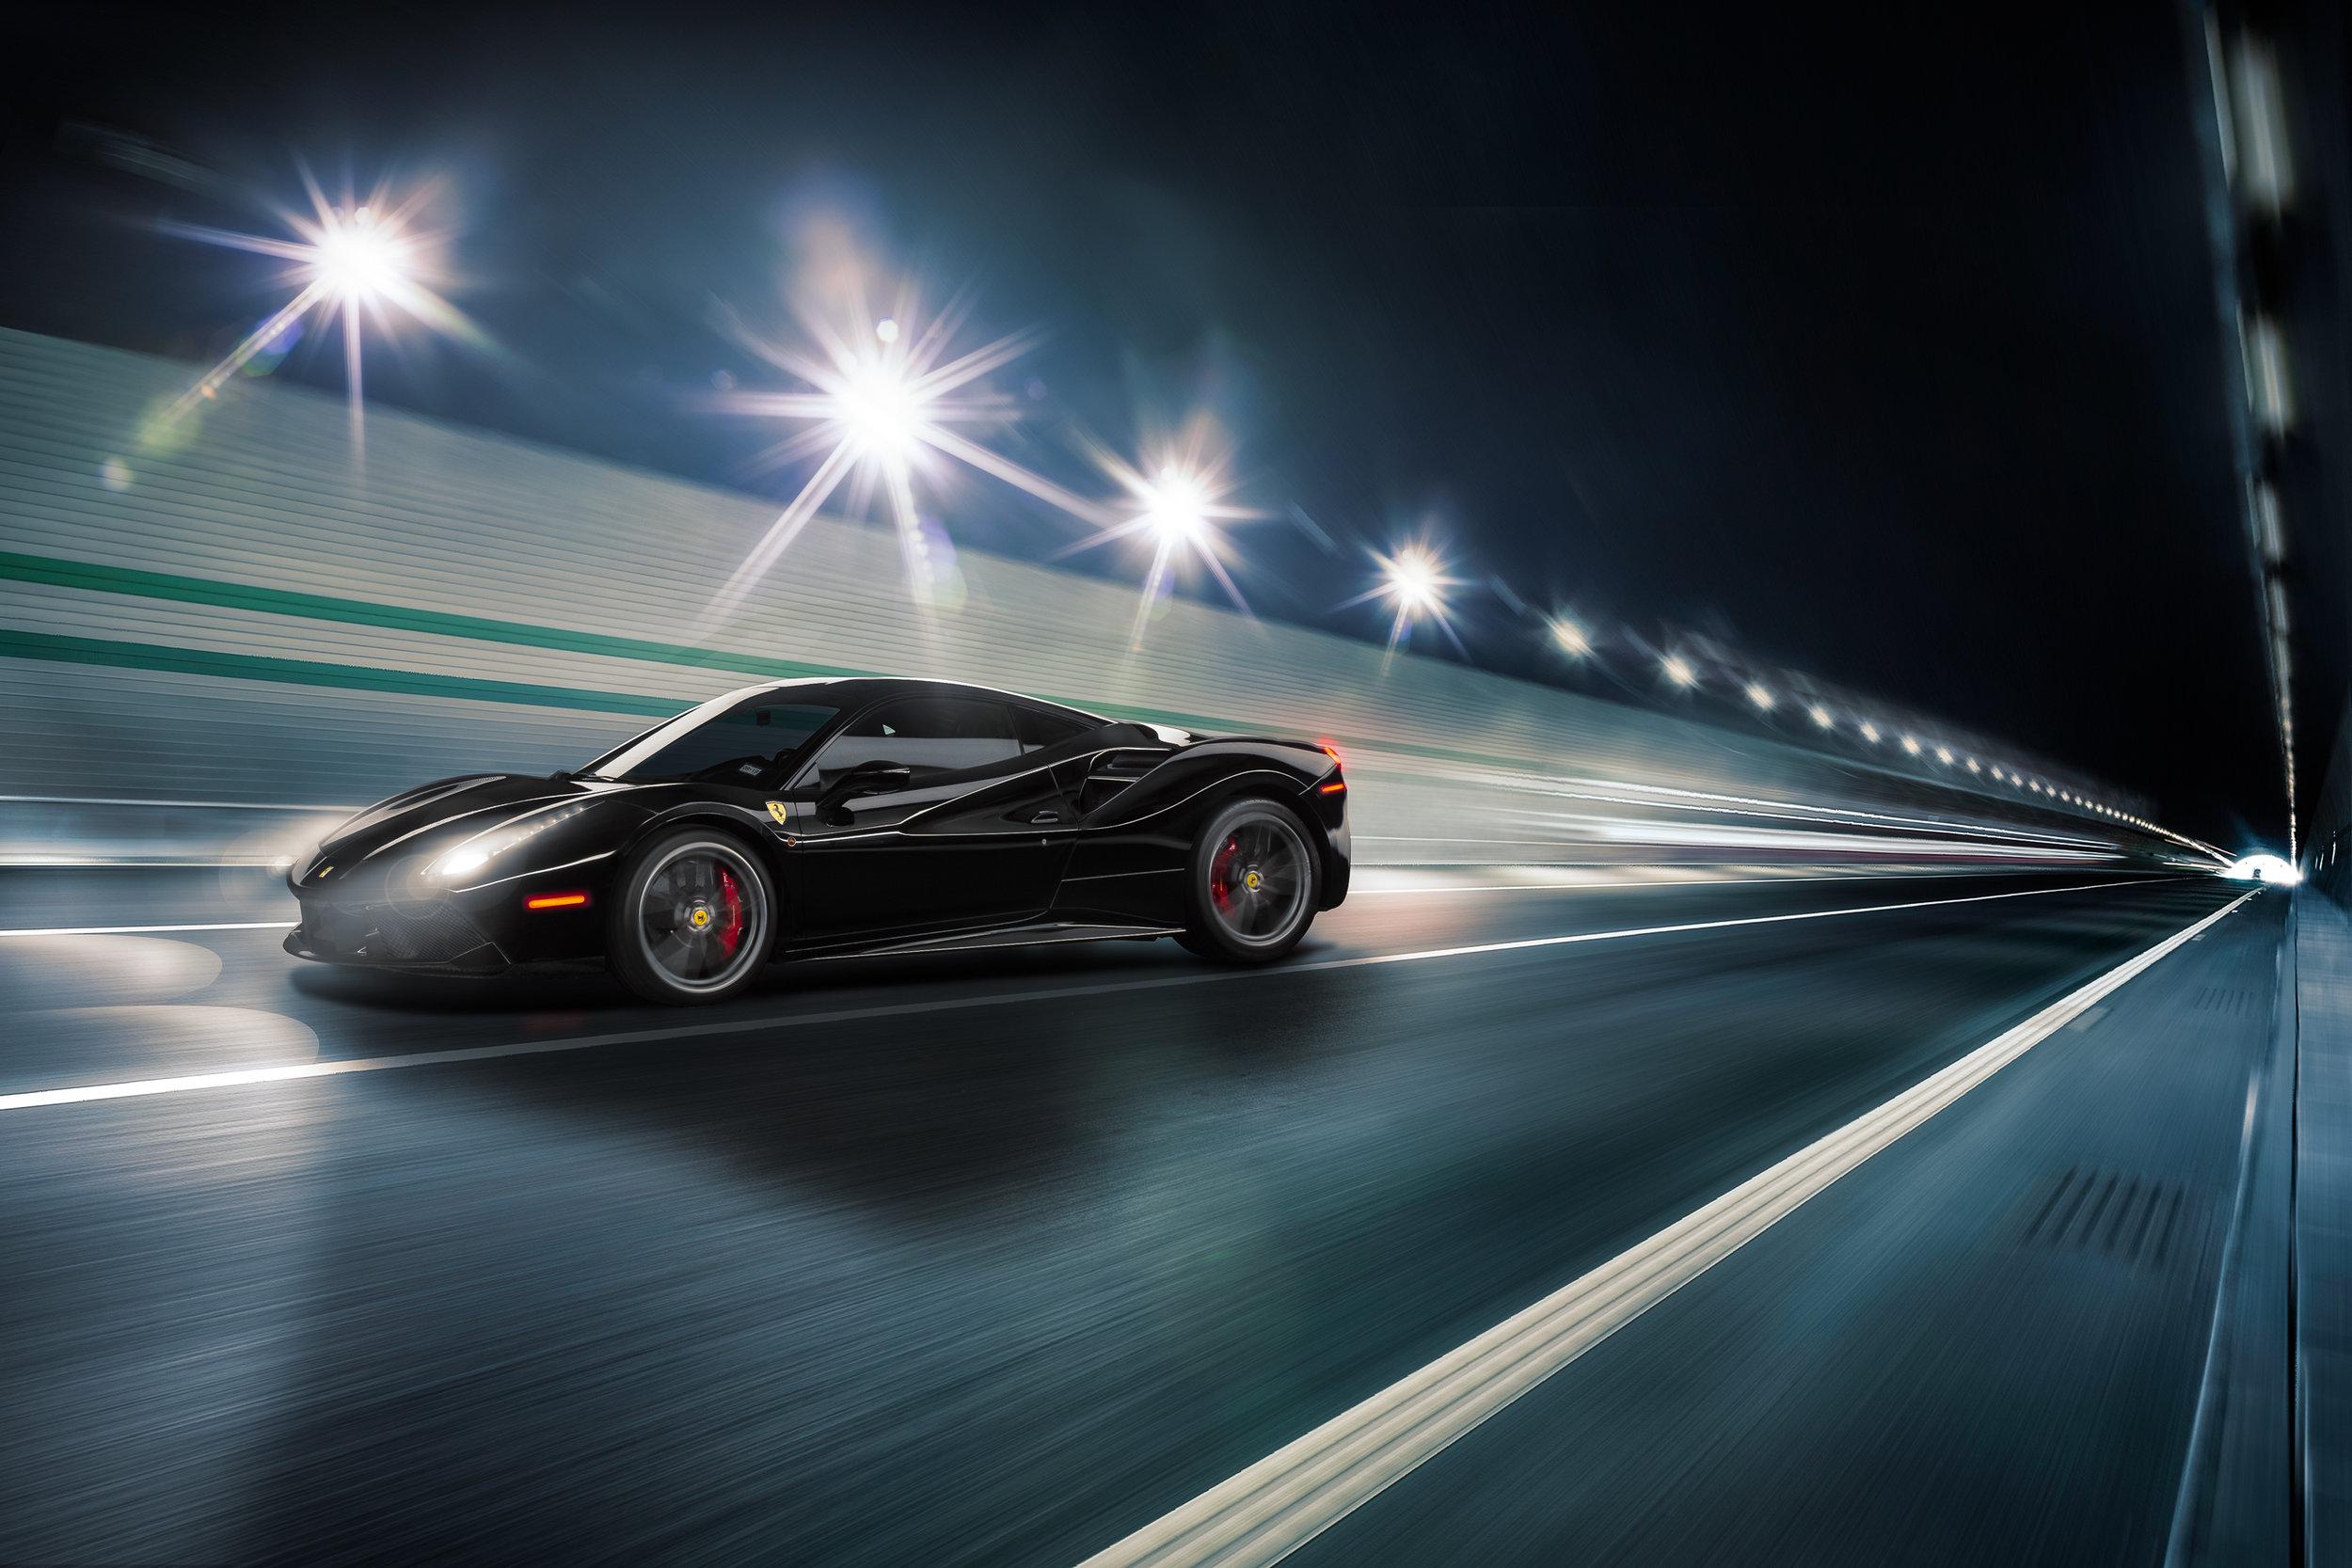 Ferrari 488 GTB Nero Daytona Speeding by Automotive Photographer Albert Polanco